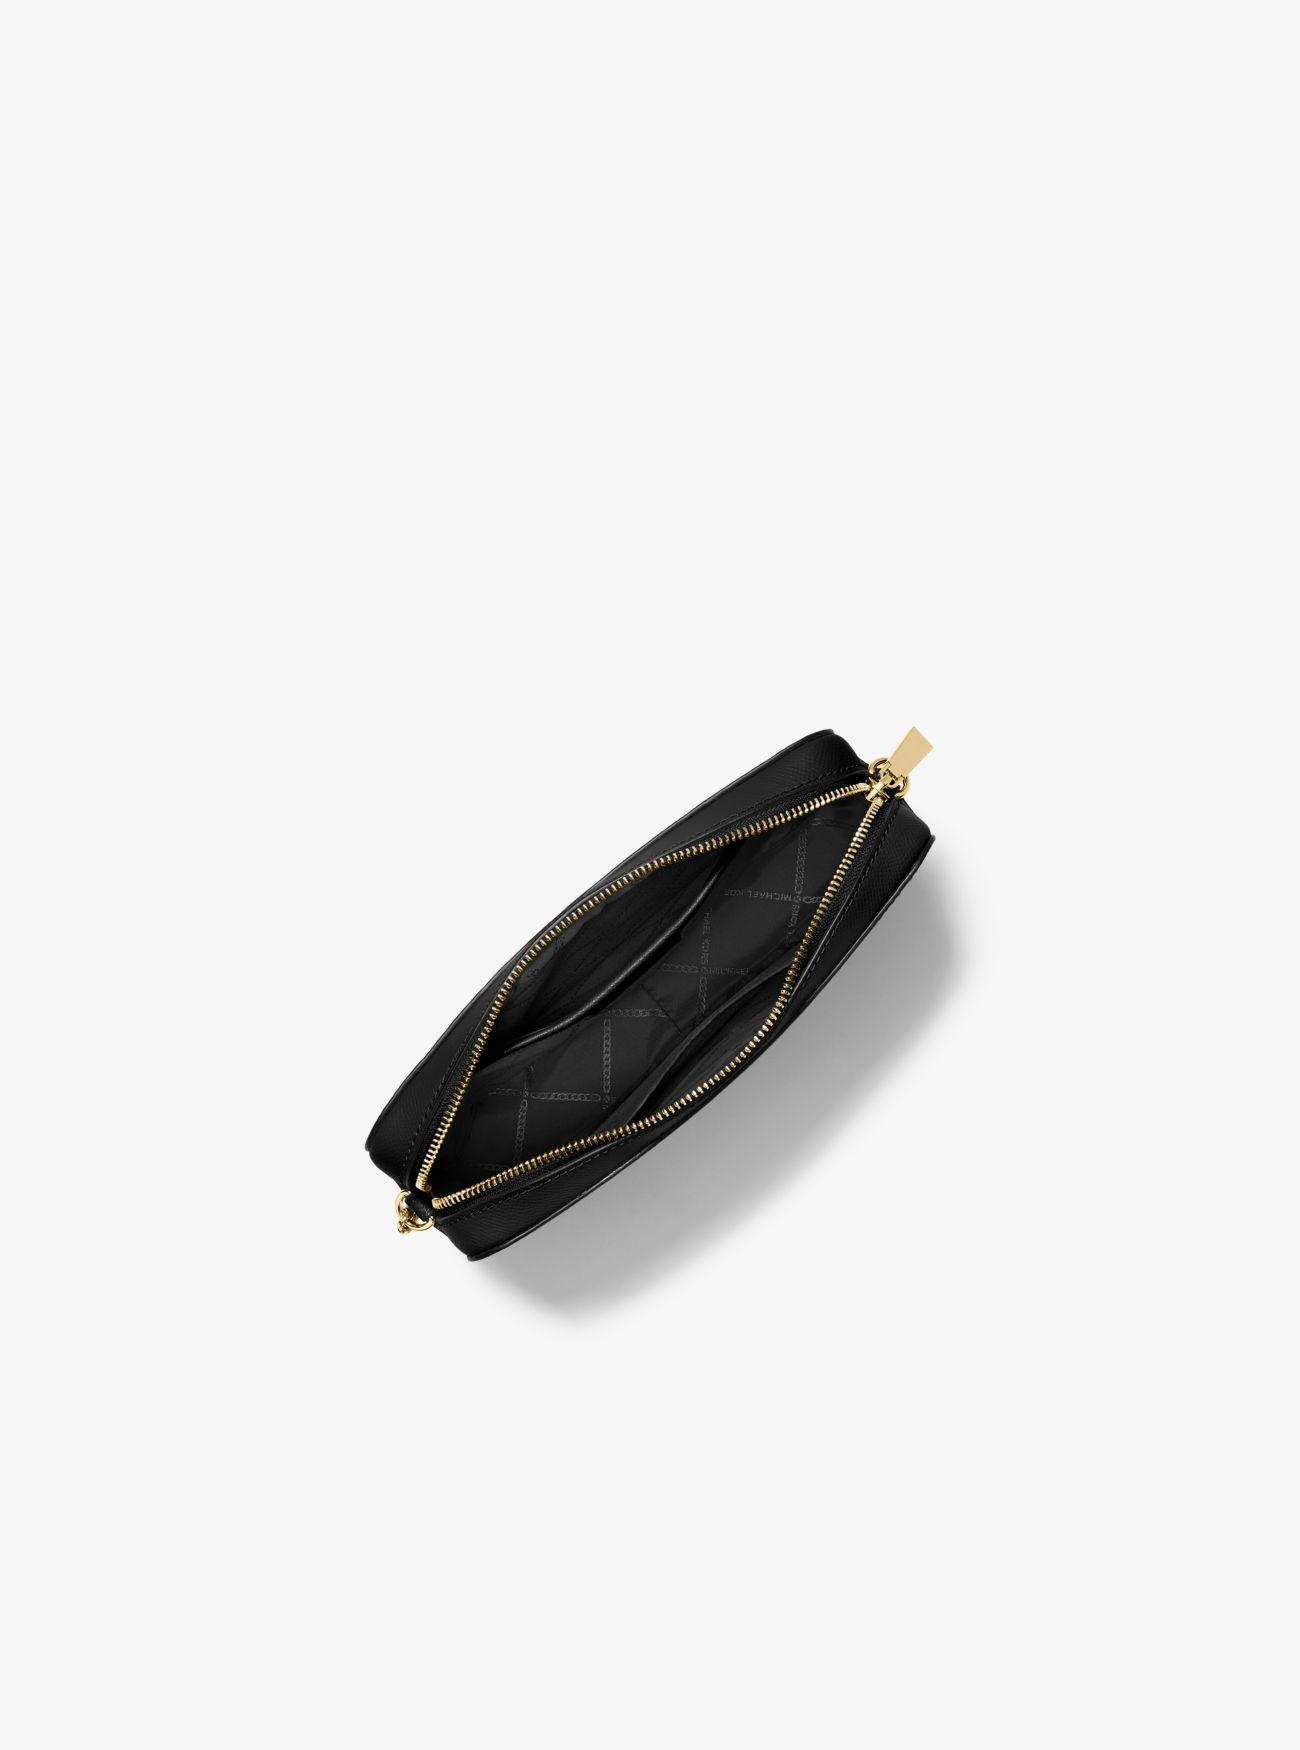 a4d646cb3ab4 Michael Kors - Black Jet Set Large Saffiano Leather Crossbody Bag - Lyst.  View fullscreen